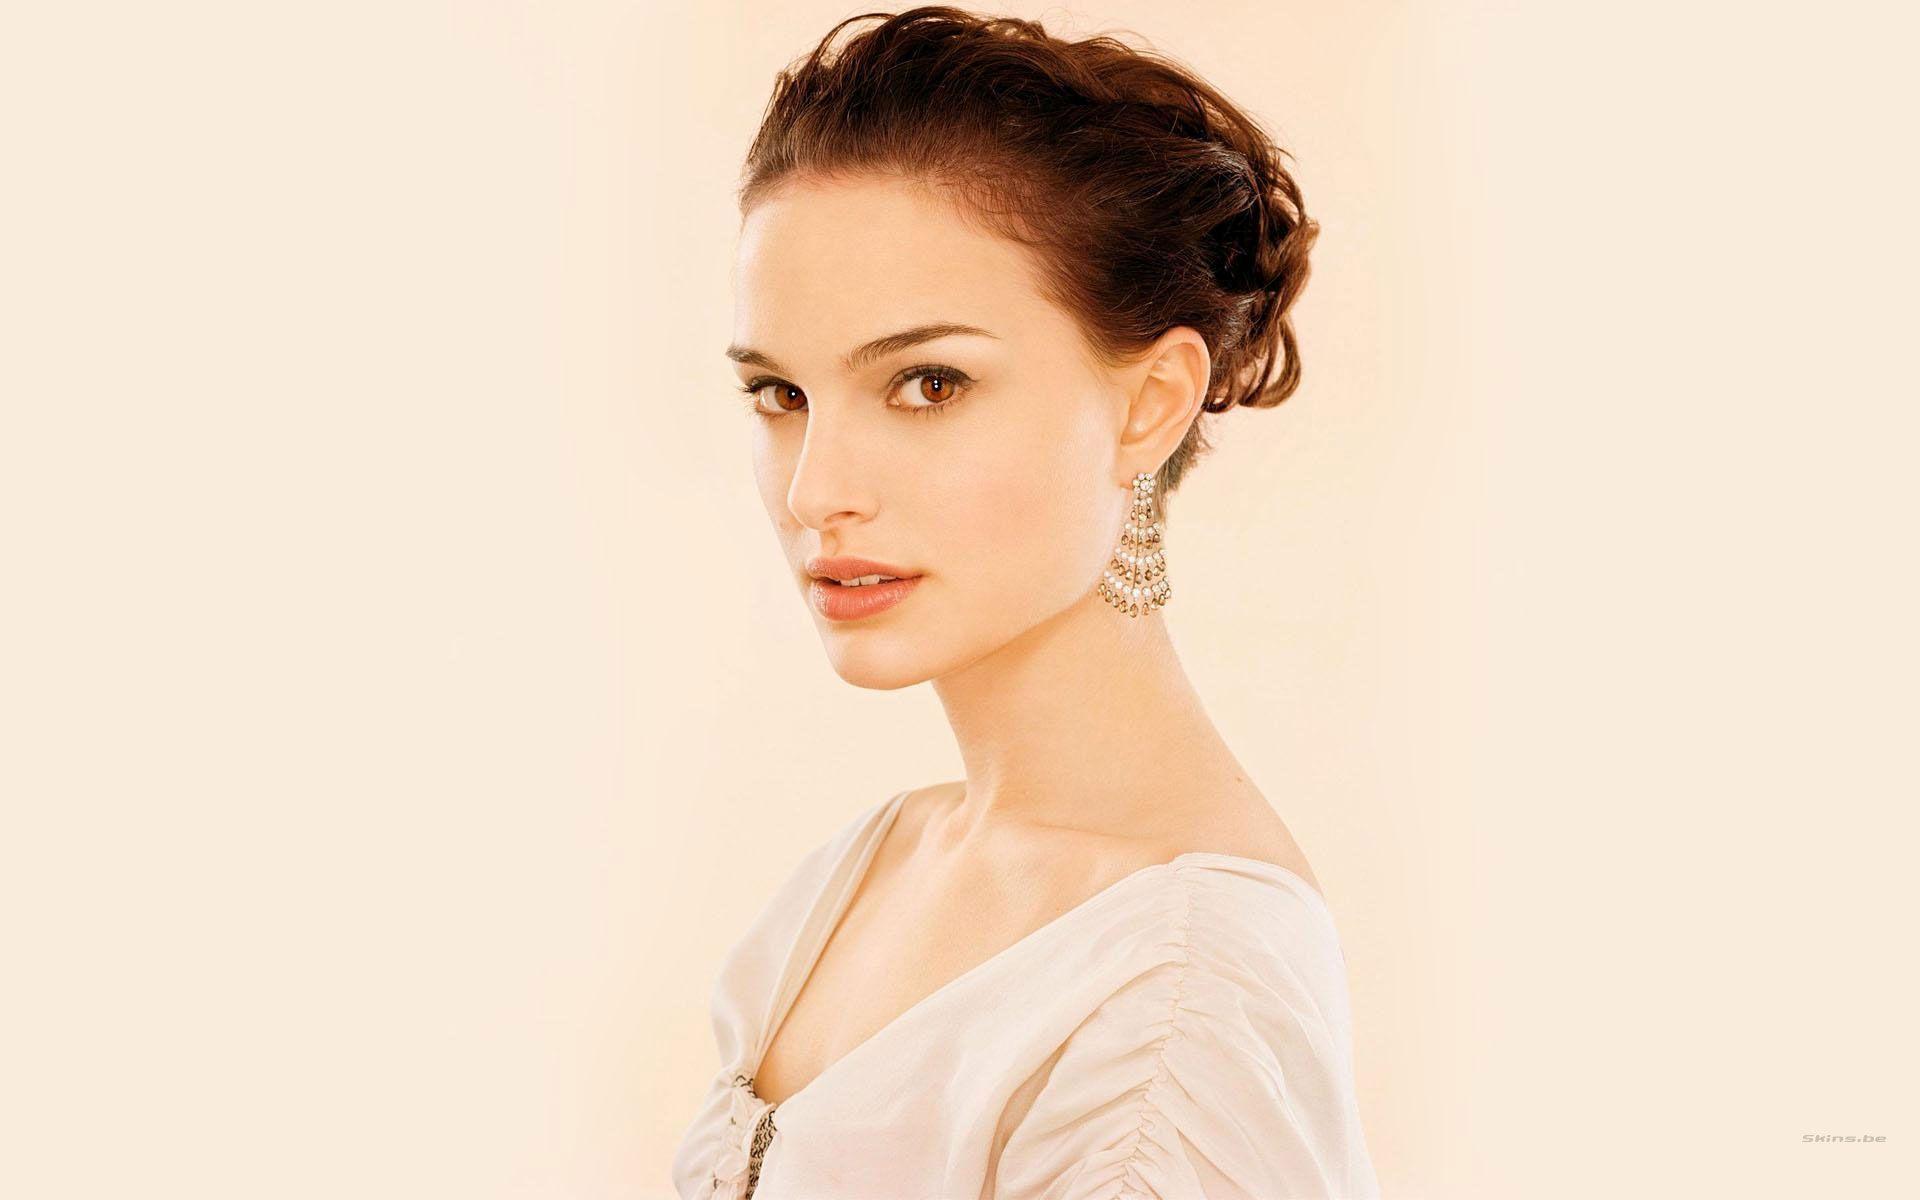 Natalie Portman Wallpapers | HD Wallpapers Base